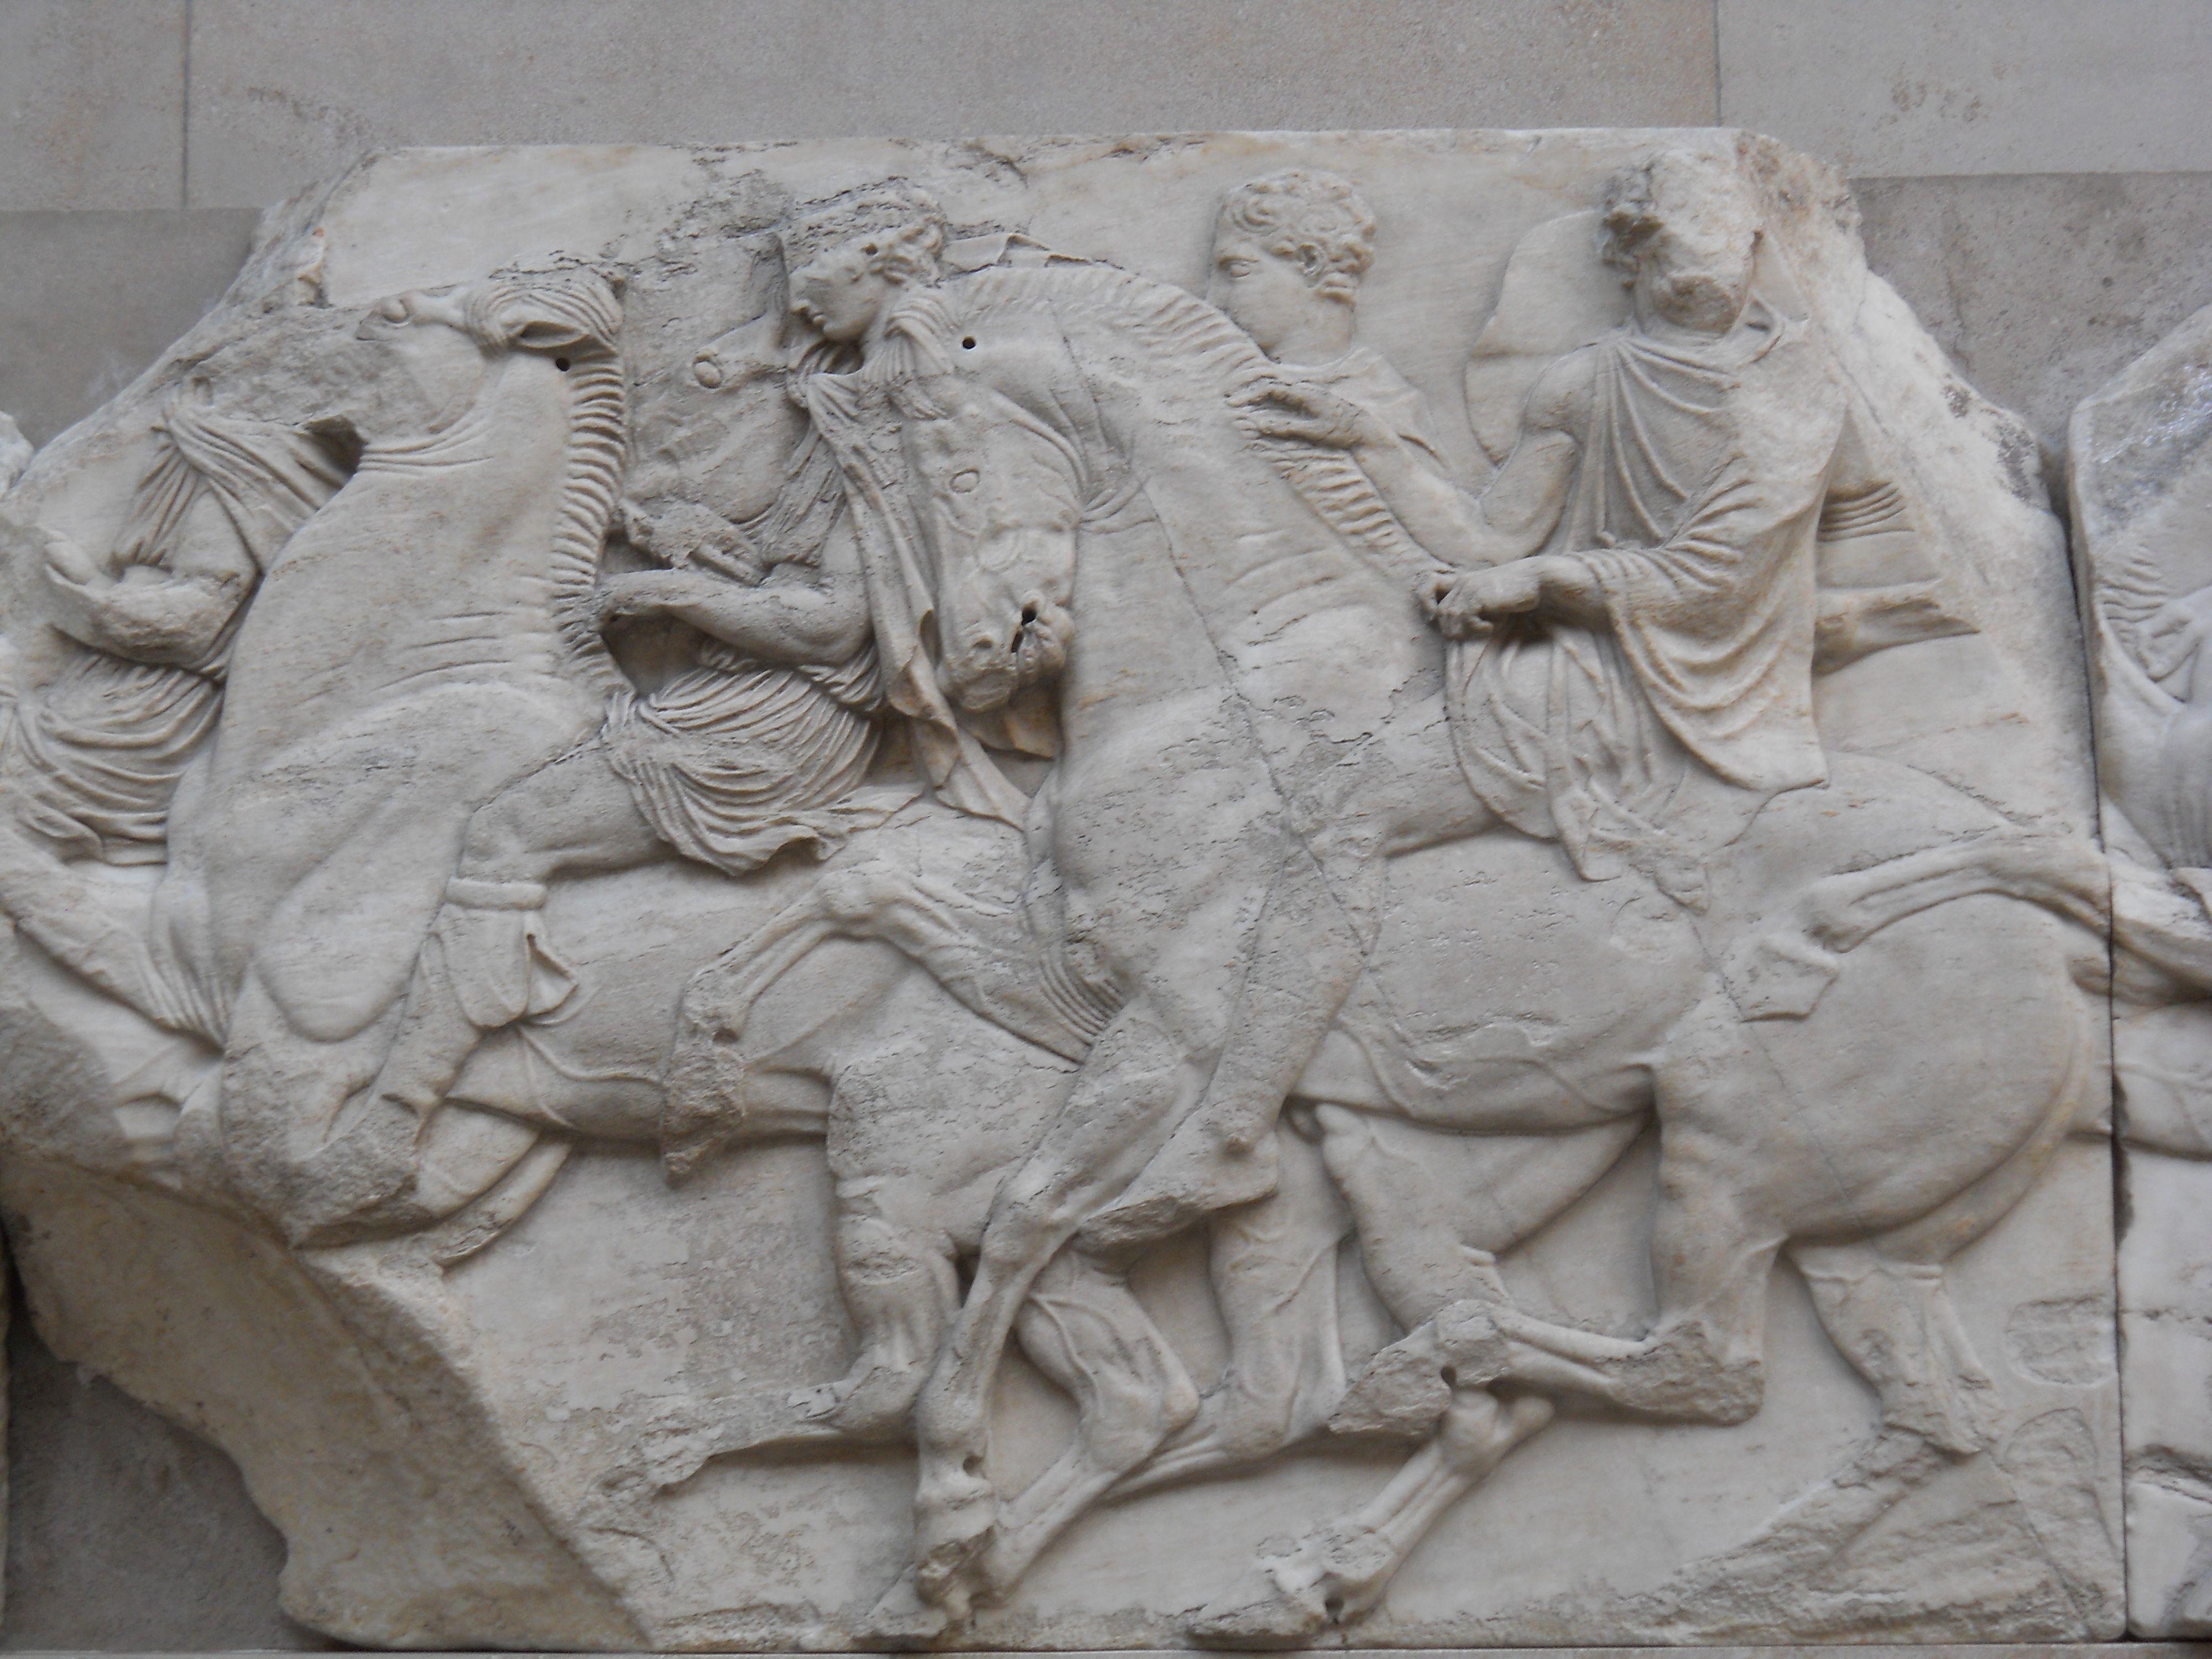 Phidias Greek Sculptor Elgin Marbles From The Parthenon 447 438 Bce British Museum London Parthenon Greek Sculpture Elgin Marbles